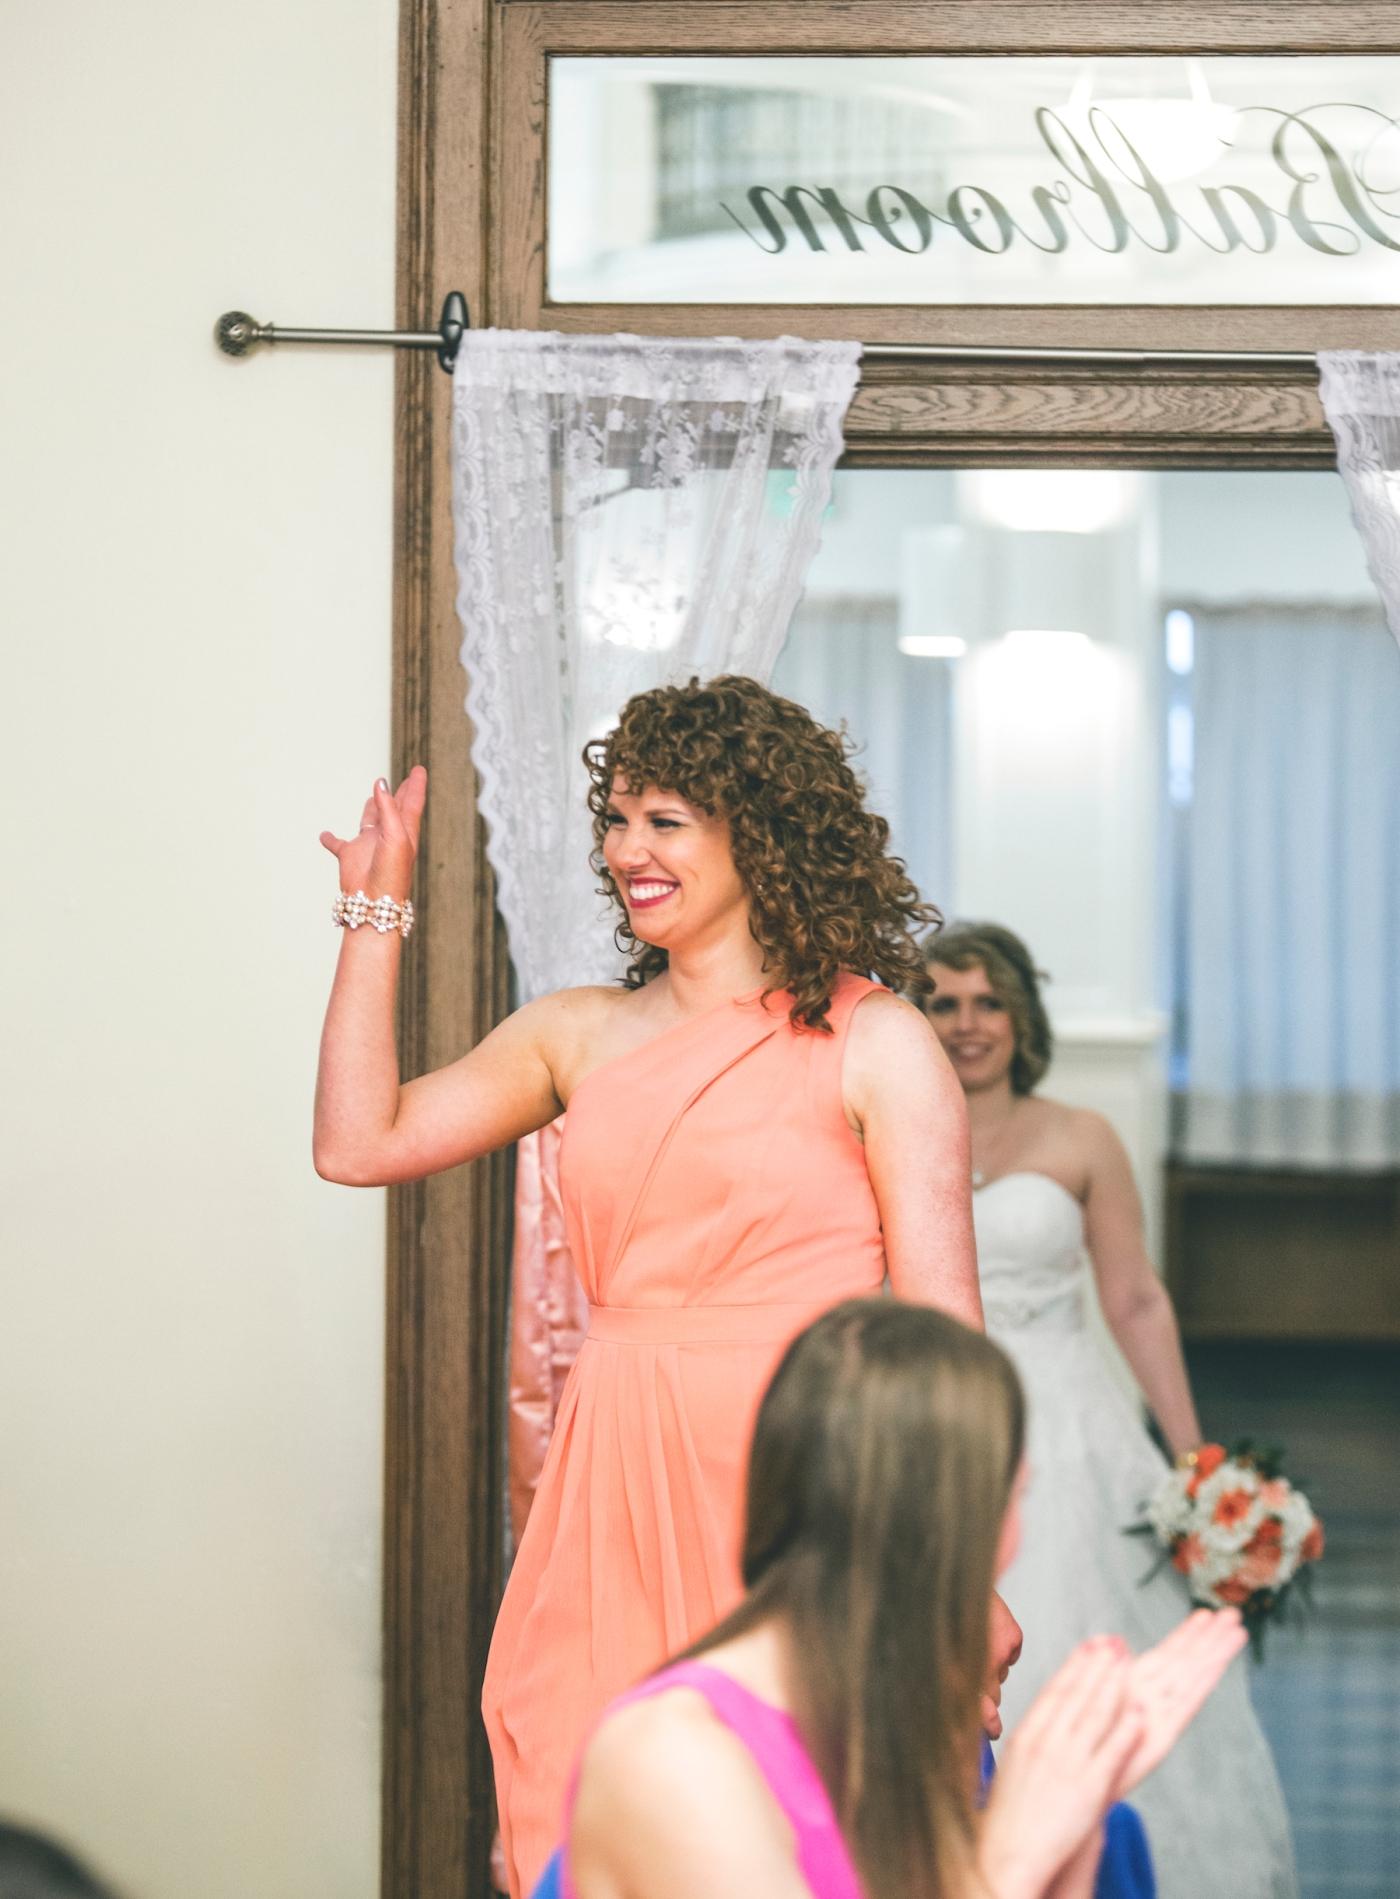 DSC_3143Everett_Wedding_Ballroom_Jane_Speleers_photography_Rachel_and_Edmund_reception_2017